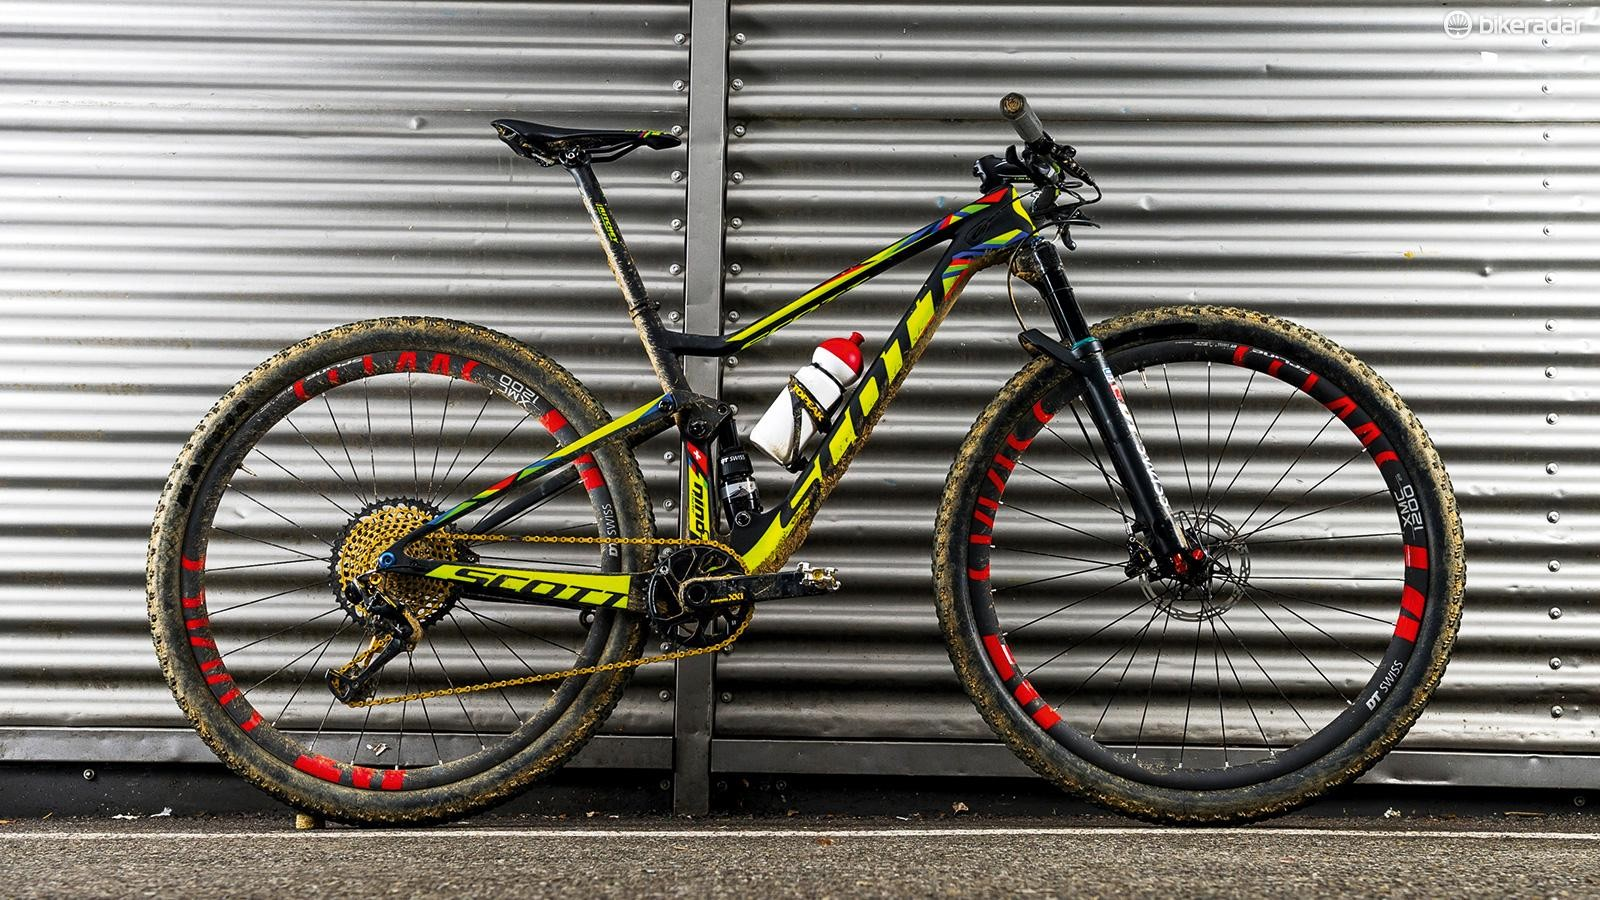 Nino Schurter's Scott Spark RC 900